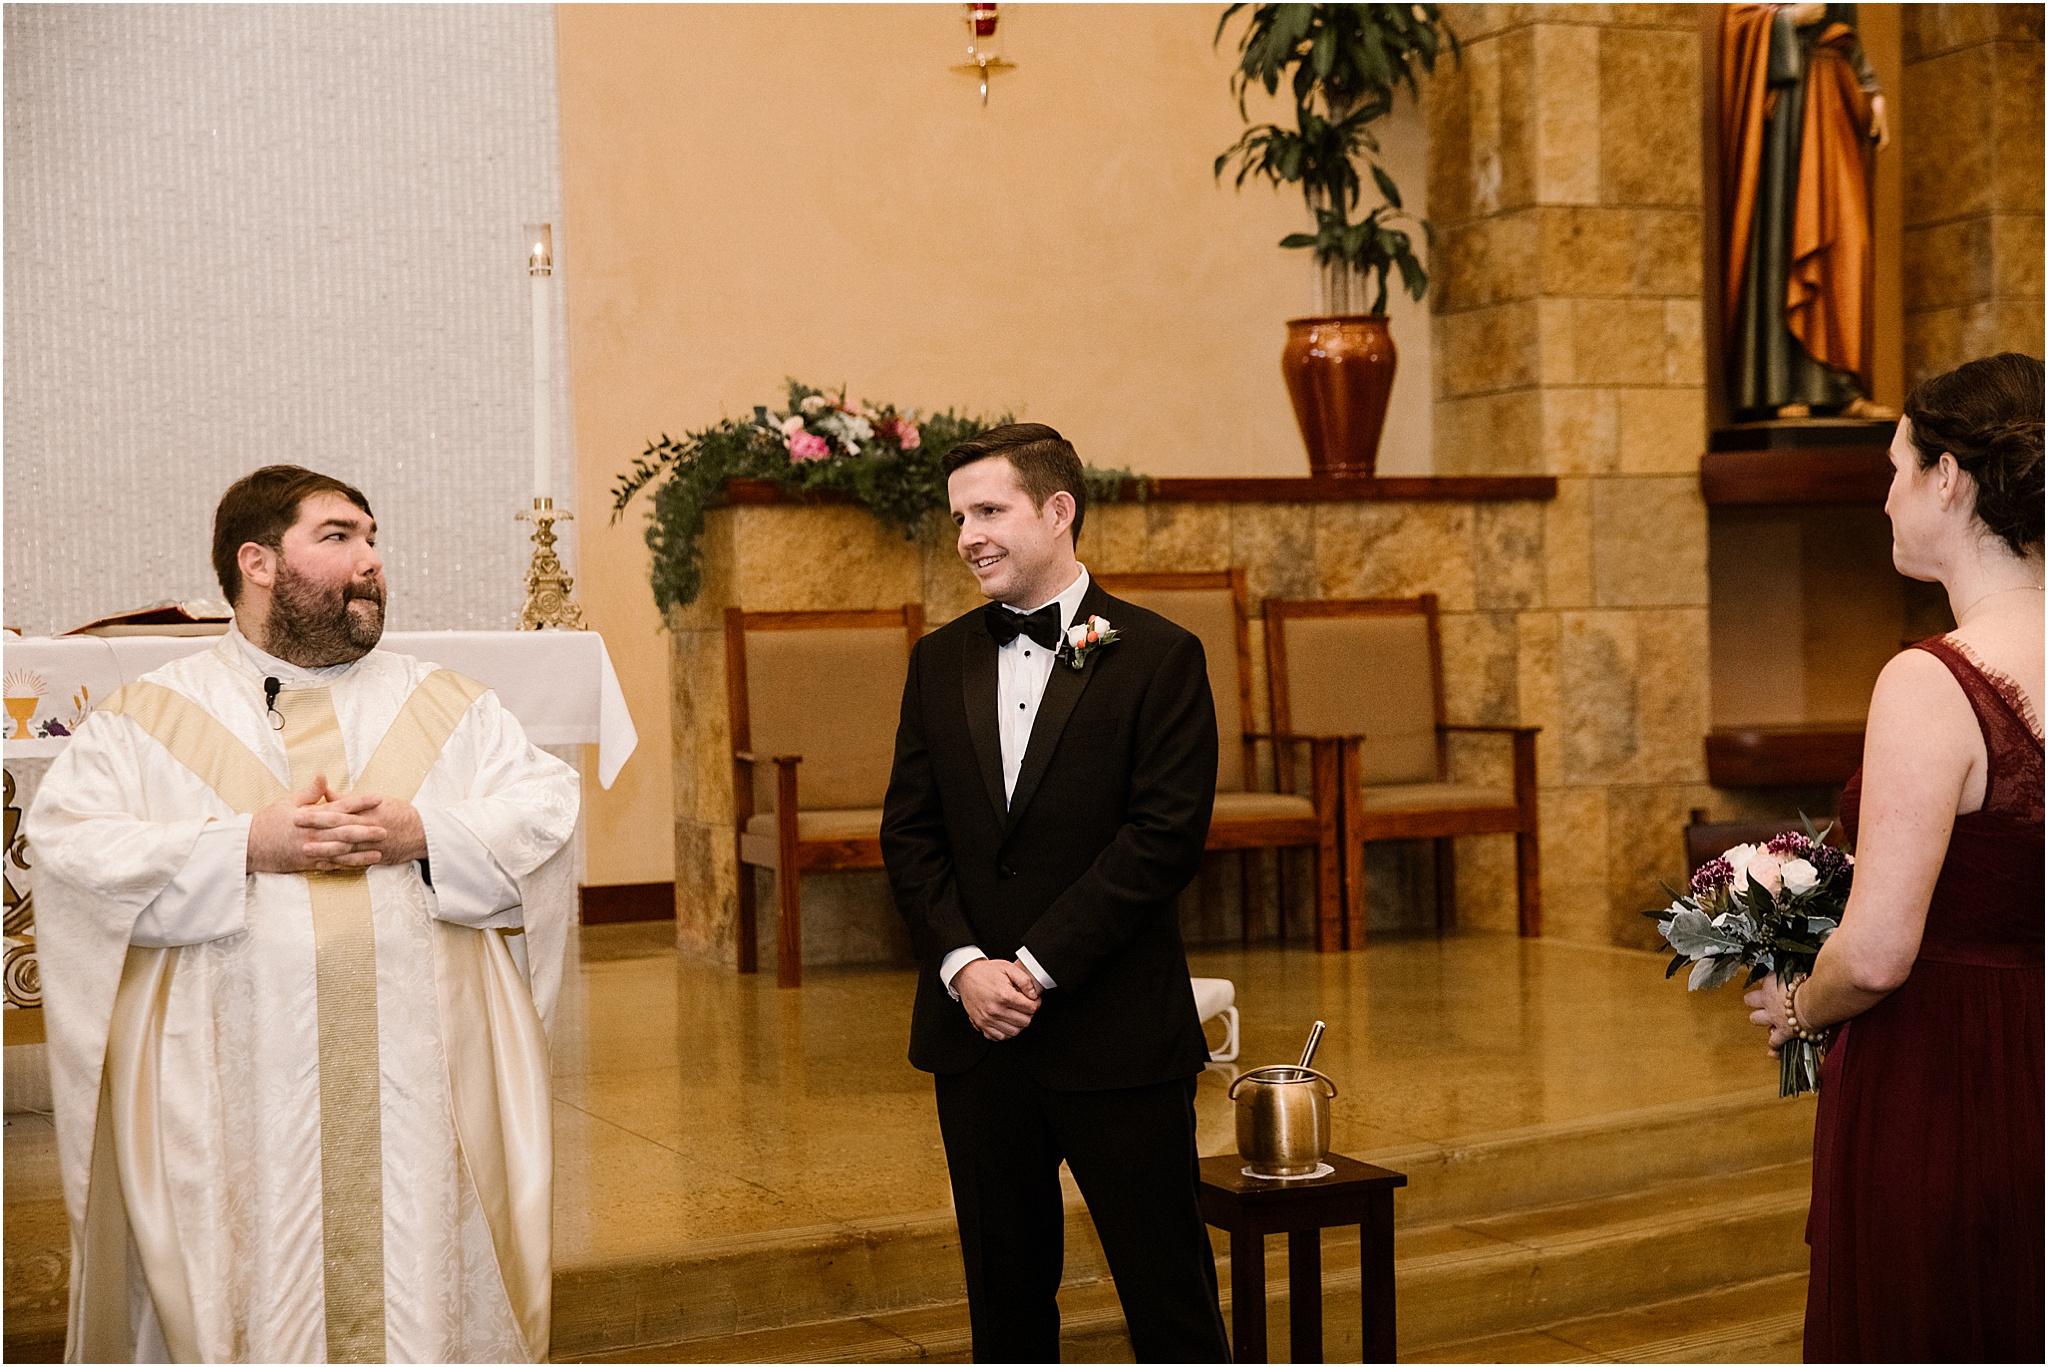 JENNA_JEROME_BLUE ROSE PHOTOGRAPHY_ABQ WEDDING_16